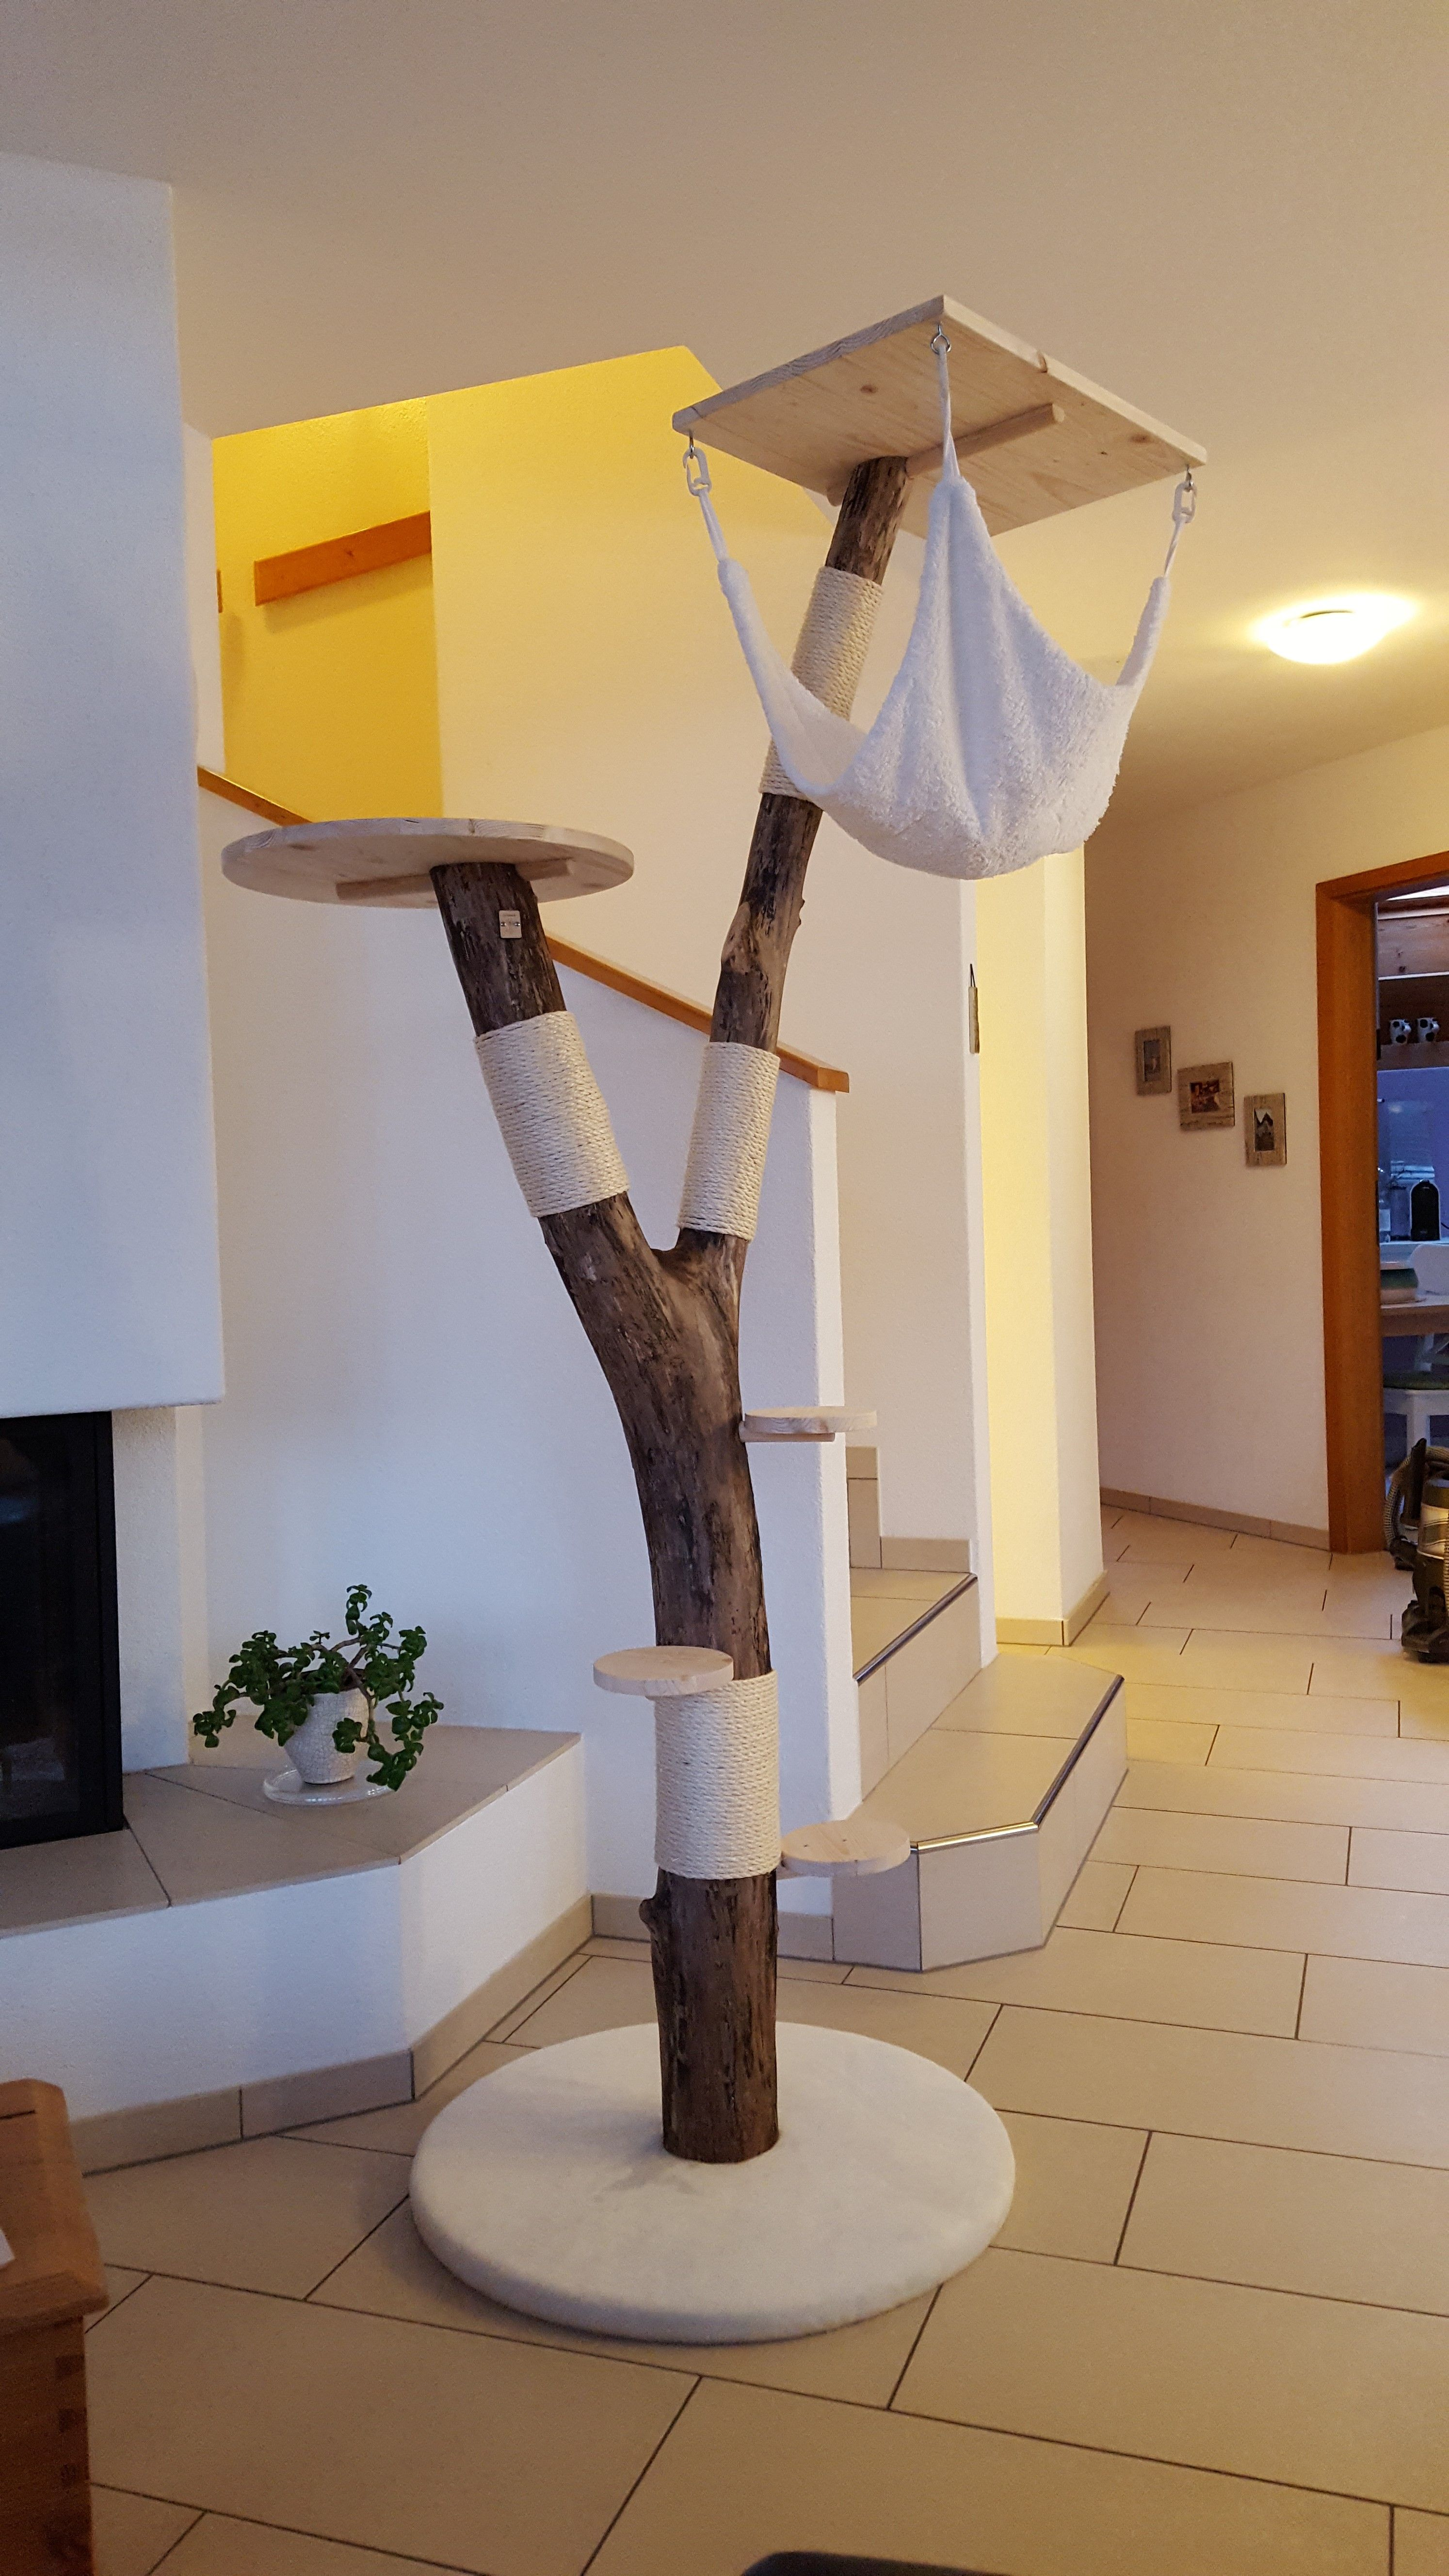 kratzbaum katzenbaum chatzebaum.ch sisal unbehandelt natur unikat